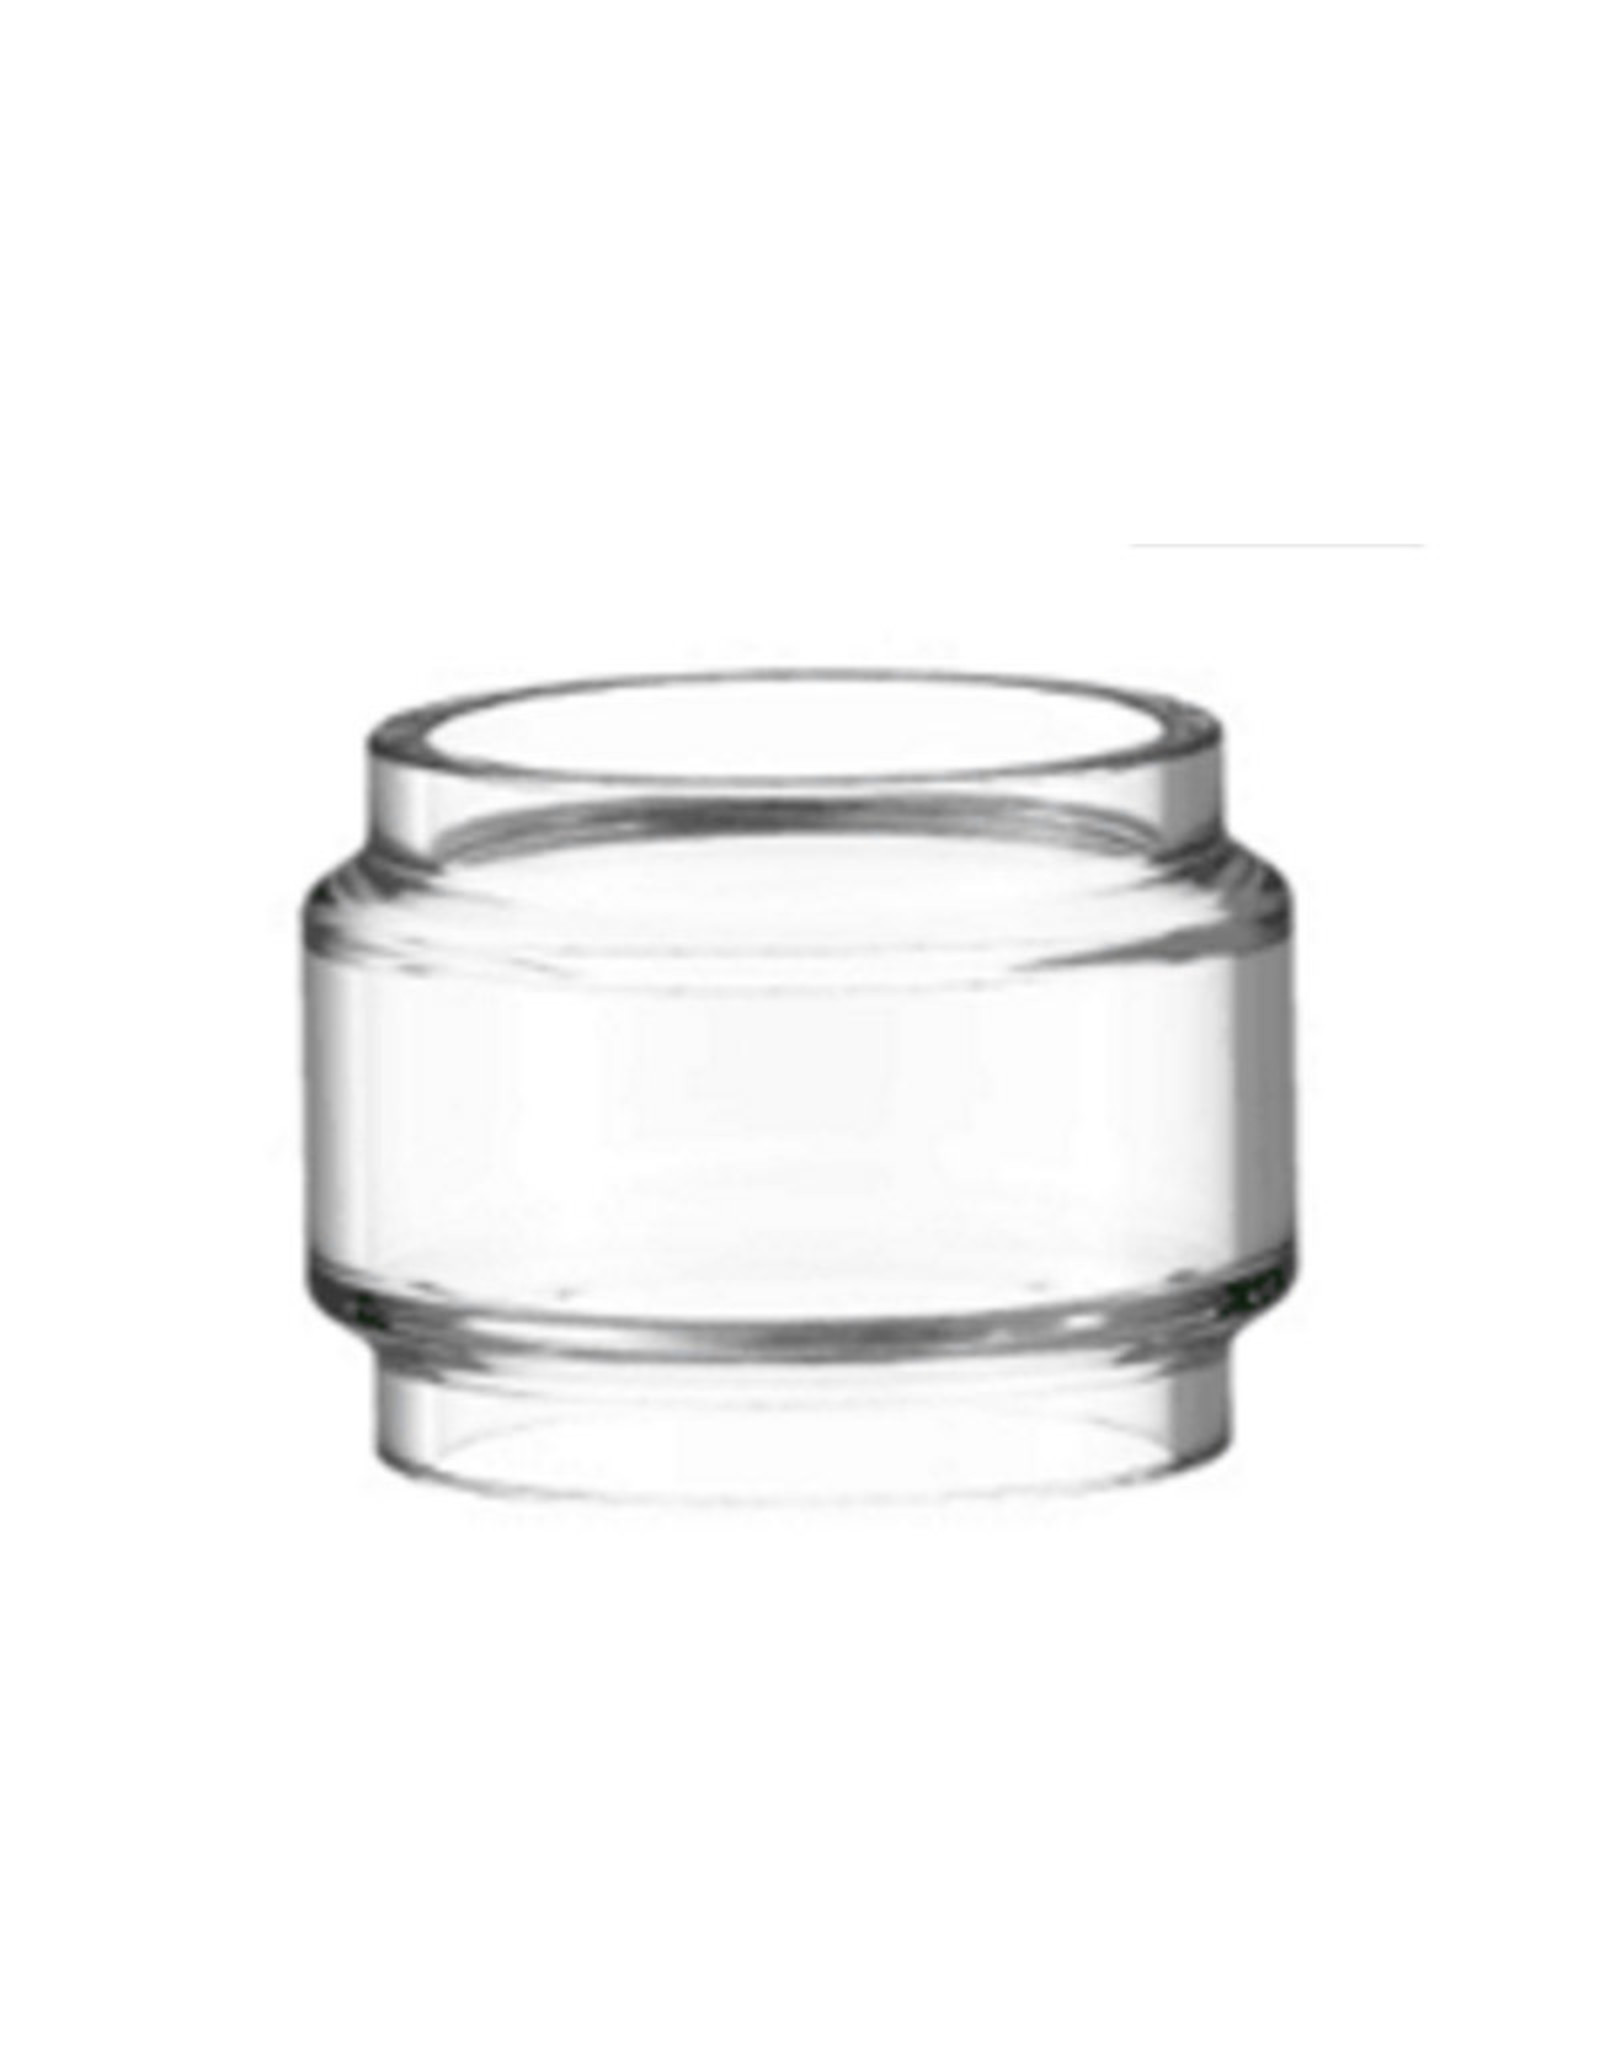 SMOK BULB PYREX GLASS TUBE #4 ( TFV8 BABY TANK)